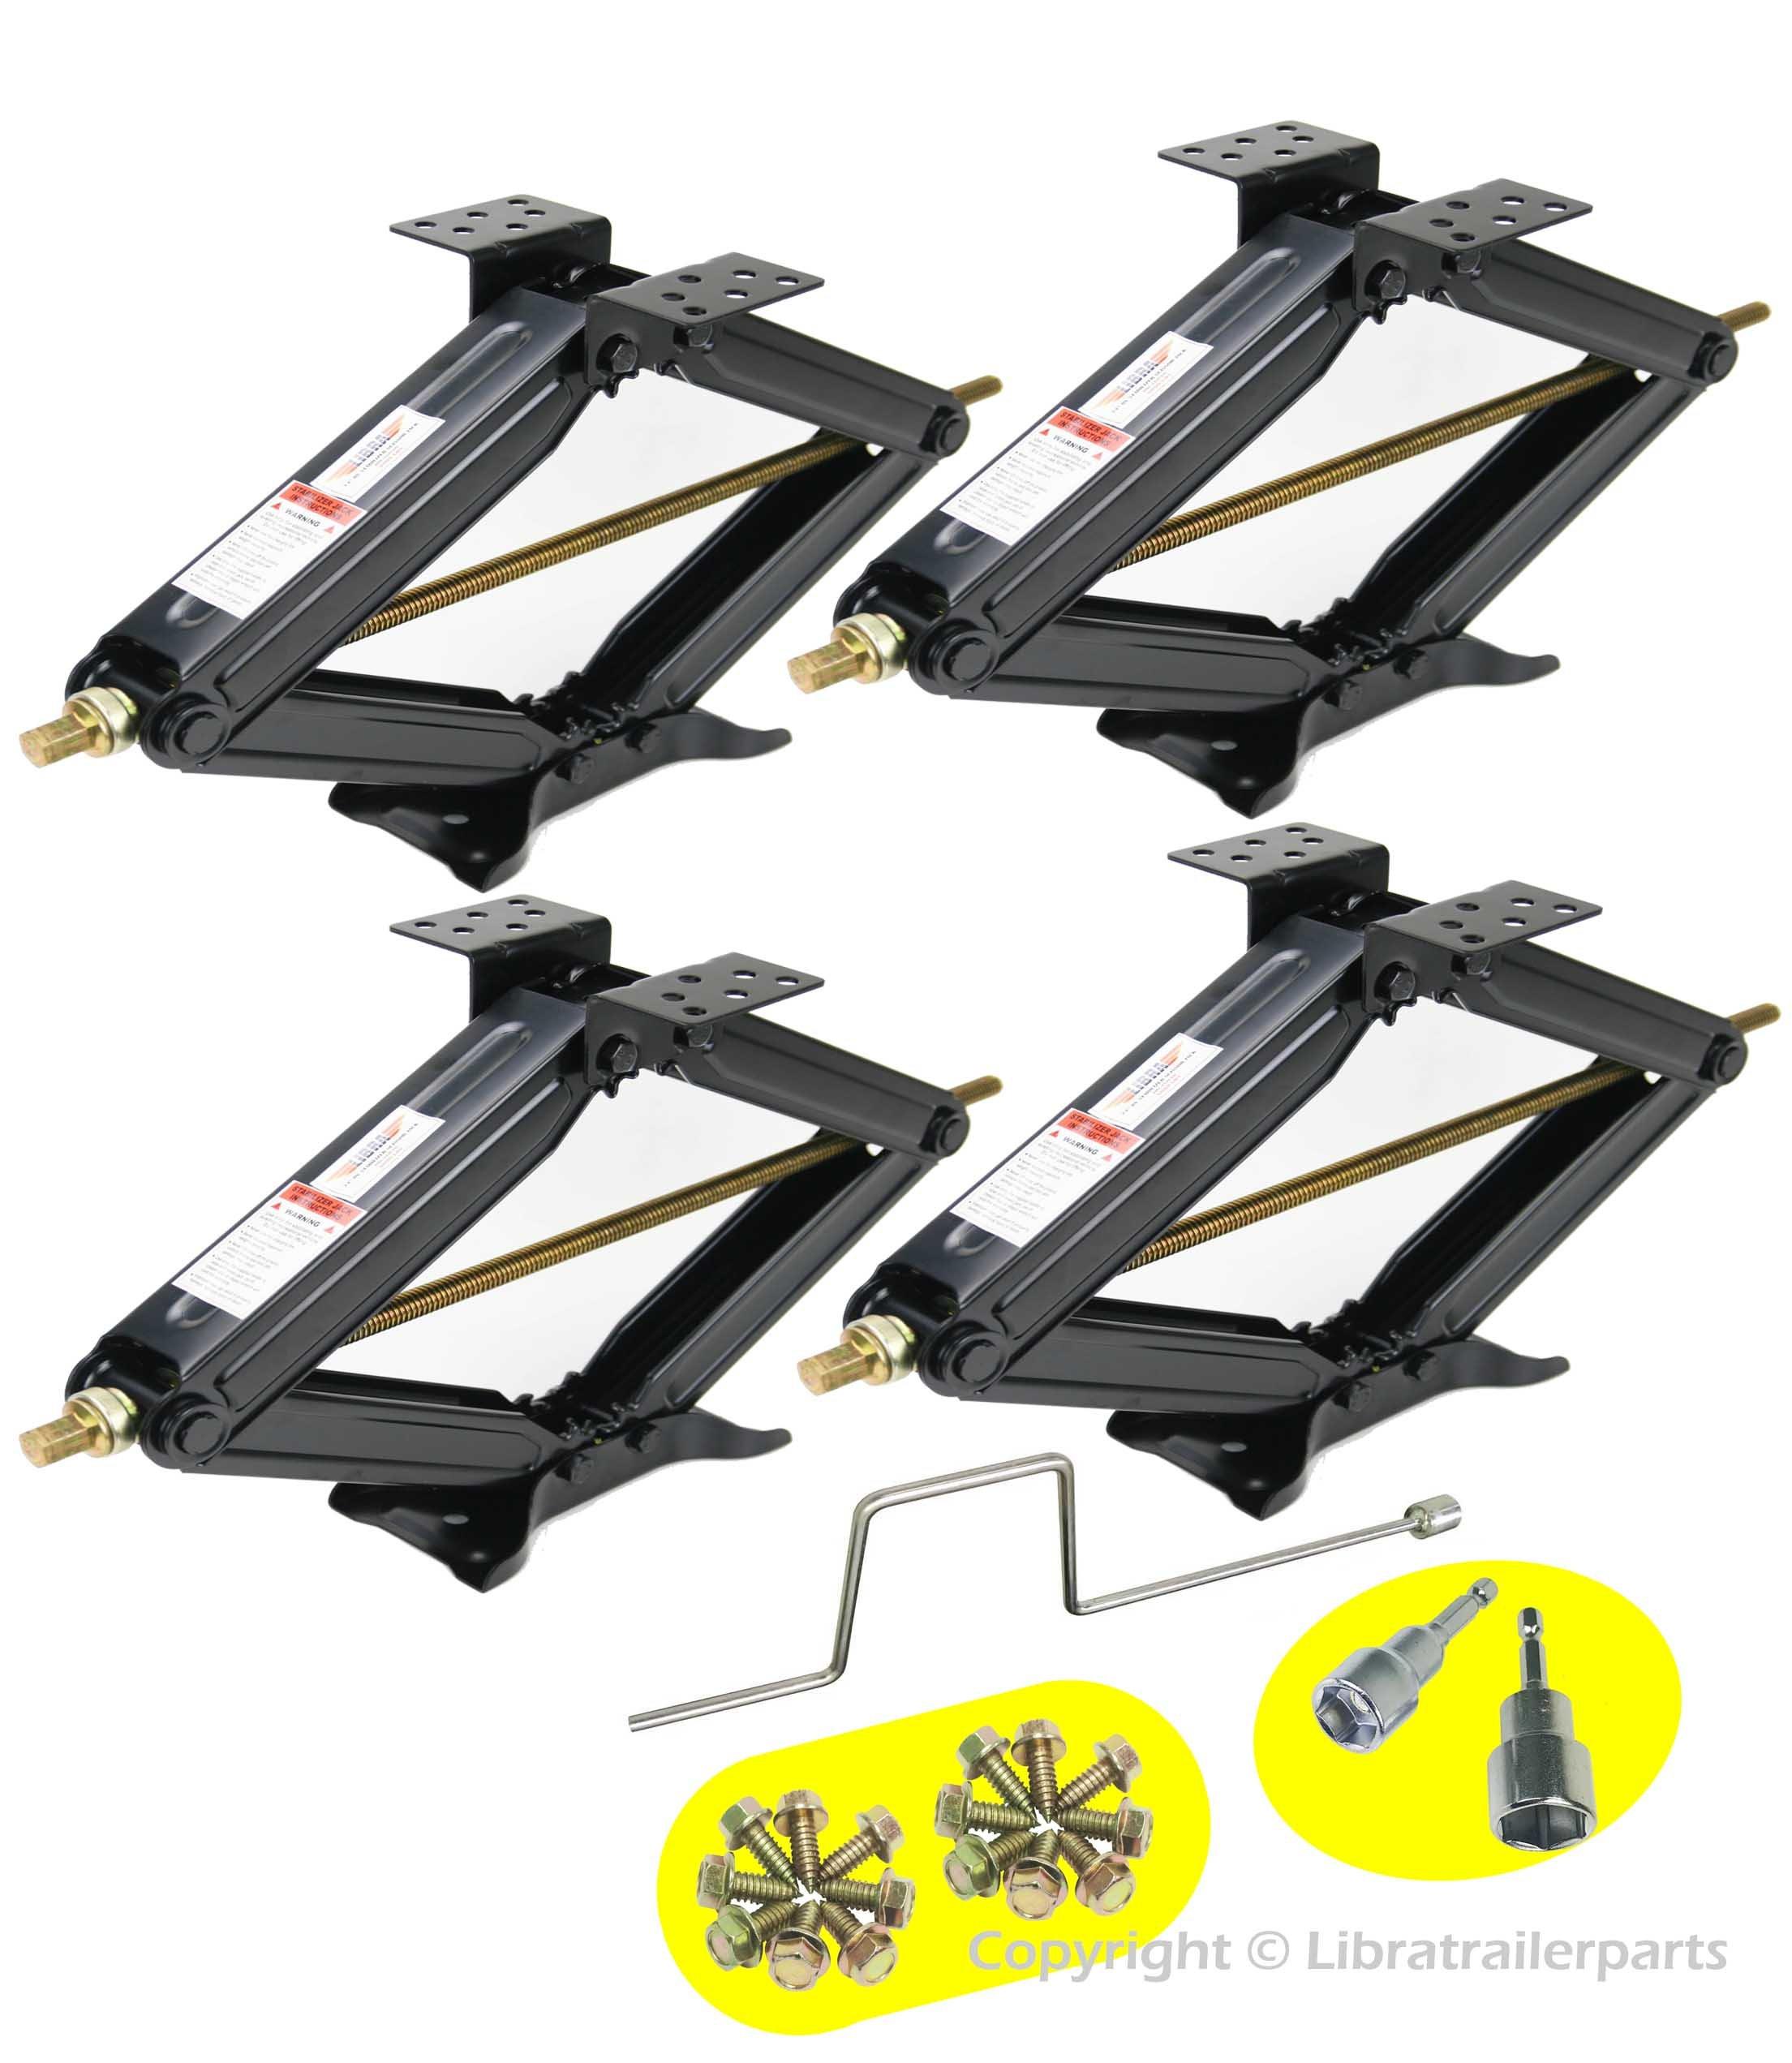 LIBRA Set of 4 5000lbs RV Trailer Stabilizer Leveling Scissor Jacks w/Handle & Dual Power Drill sockets & mounting Hardware by LIBRA